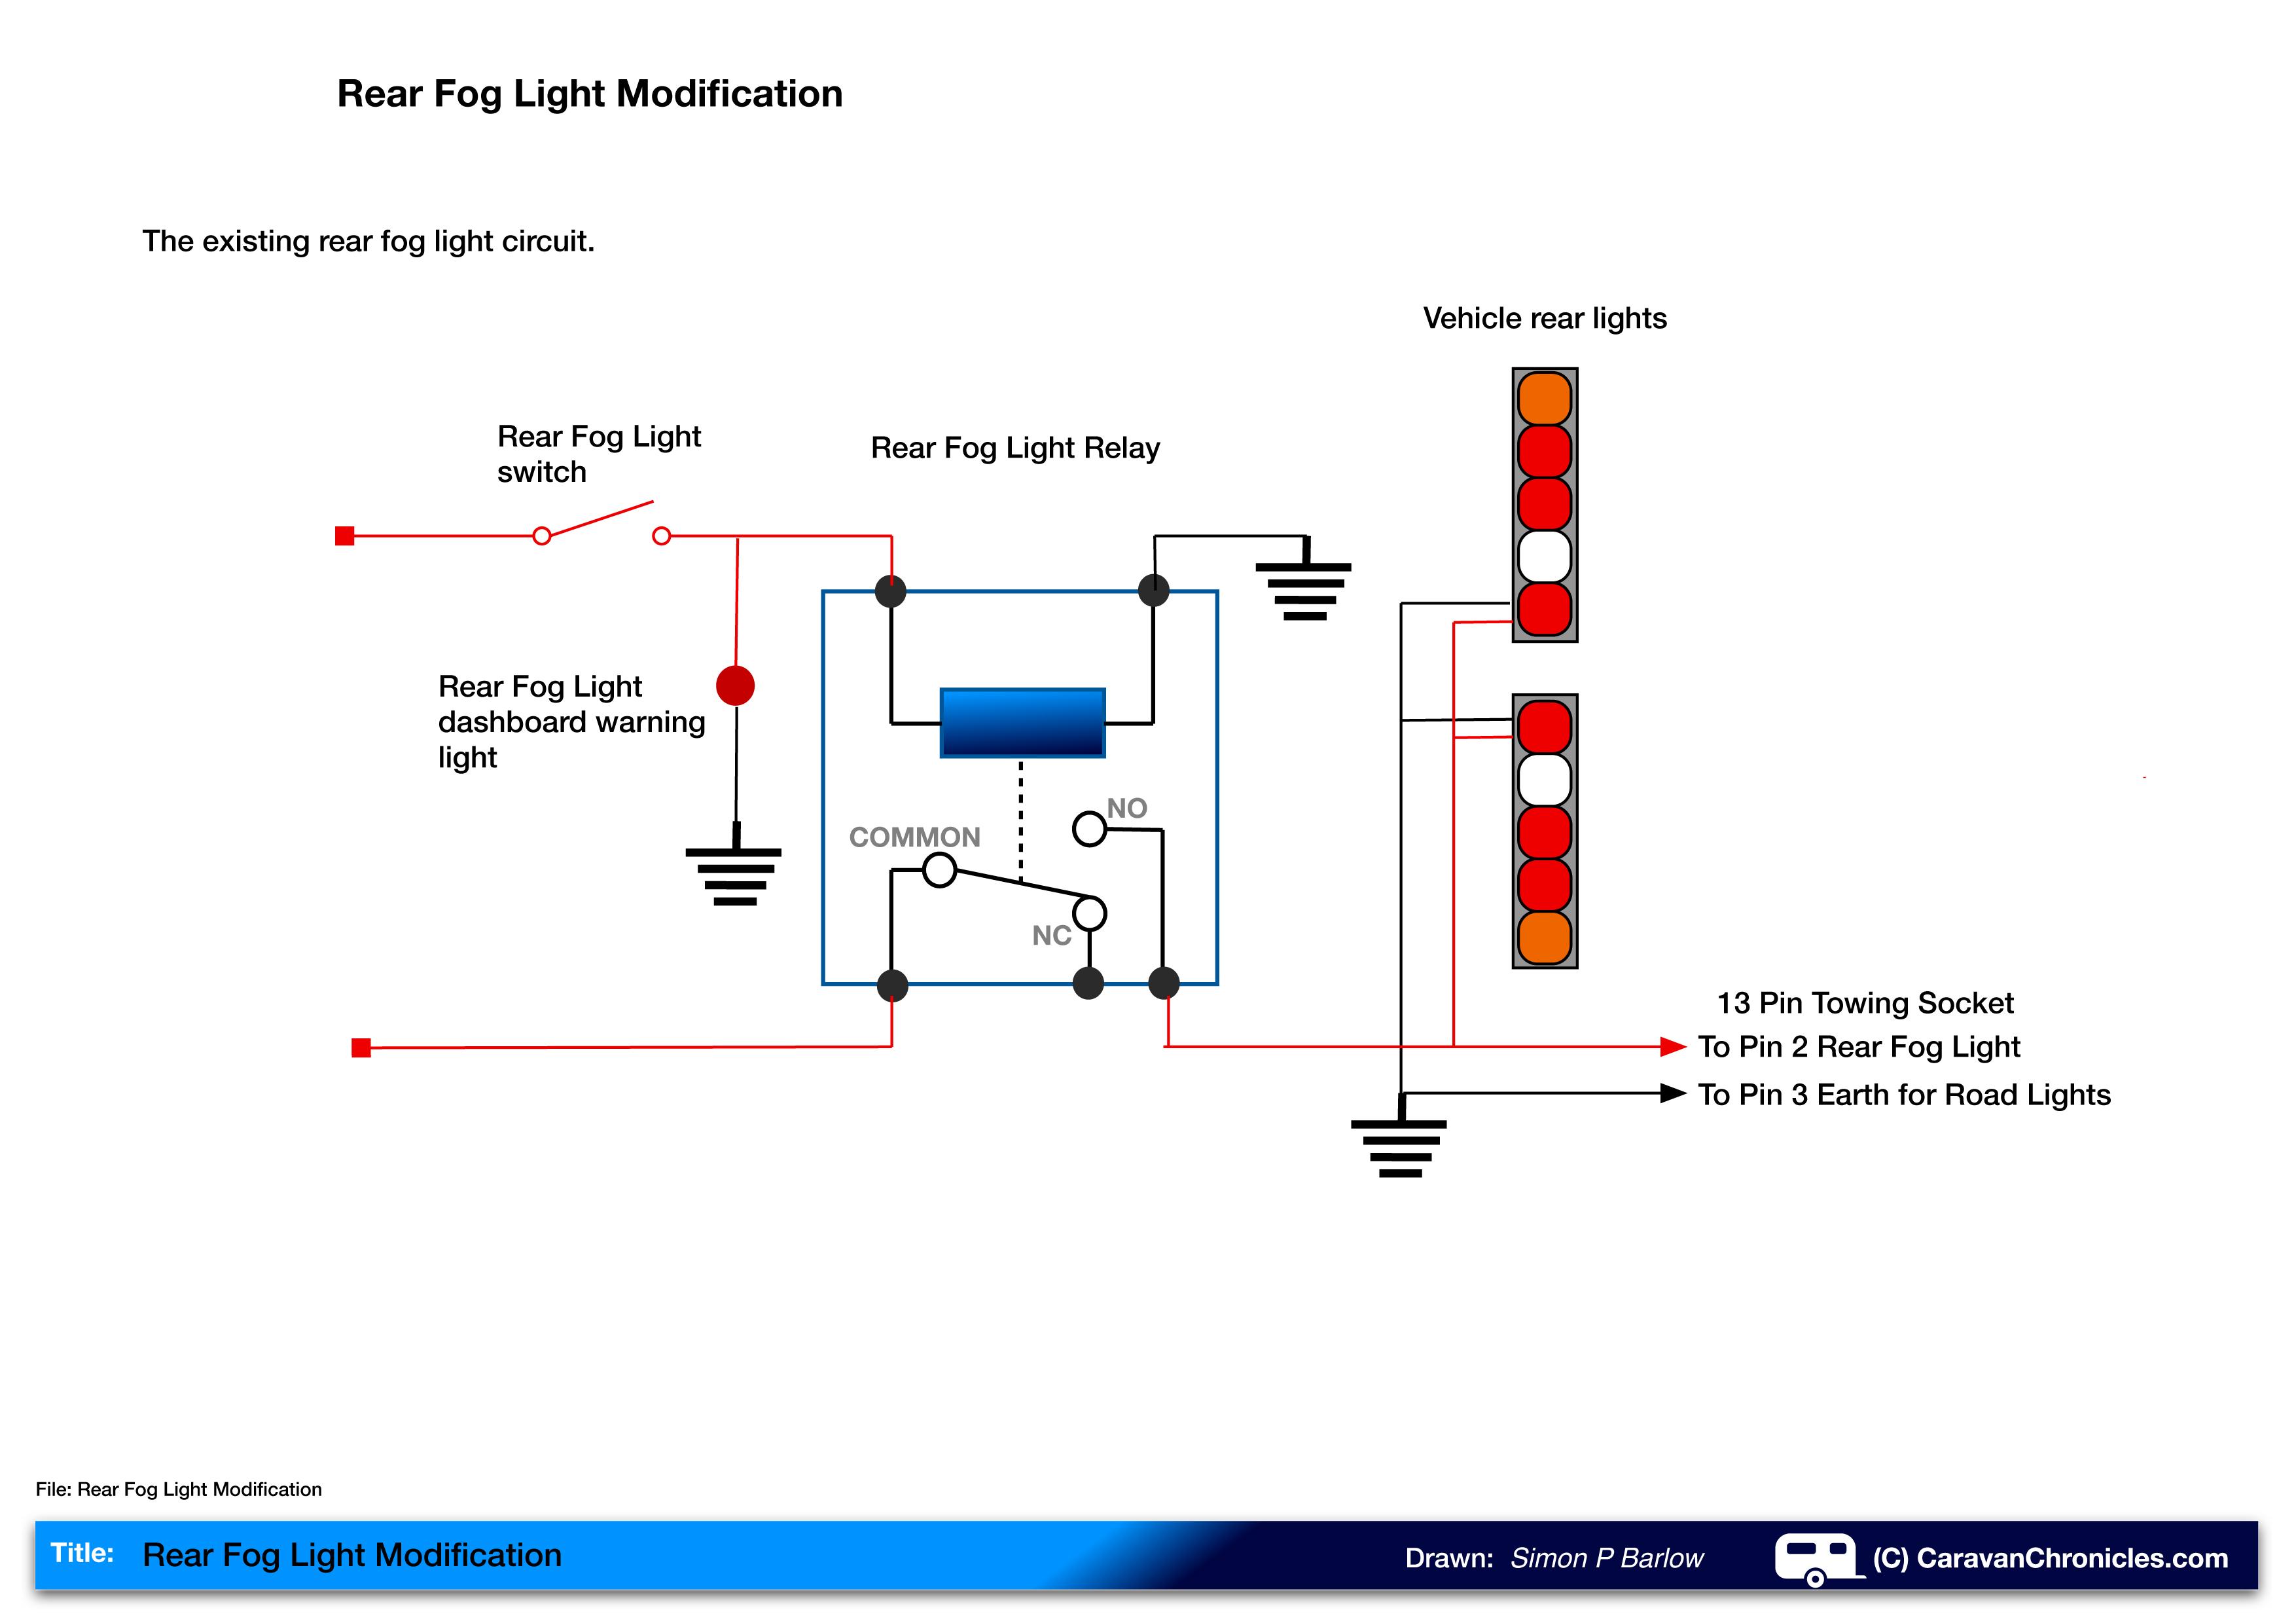 hella relay wiring diagram 2 mitsubishi pajero alternator best library modify your rear fog lights caravan chronicles rh caravanchronicles com light